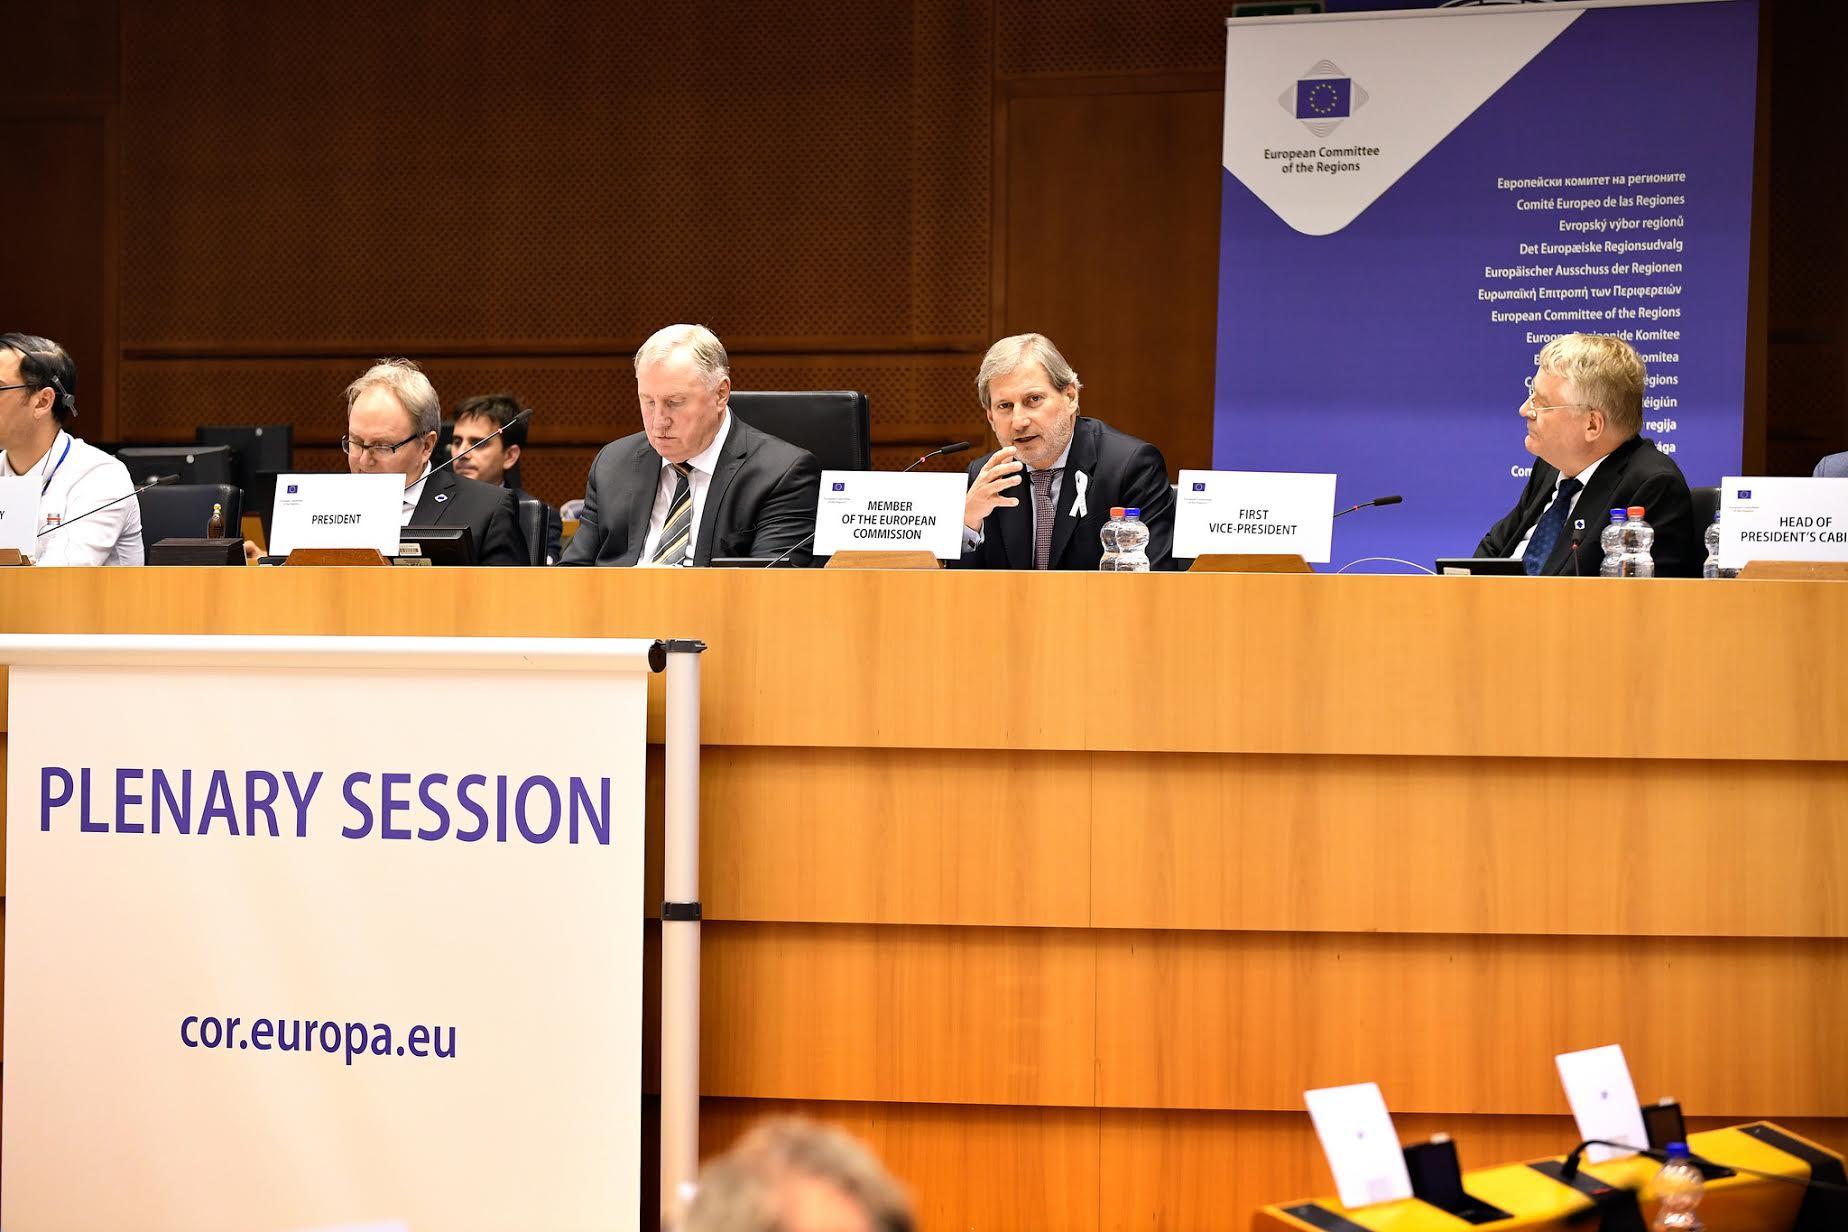 CoR: Small butpositiveedge for Western Balkans